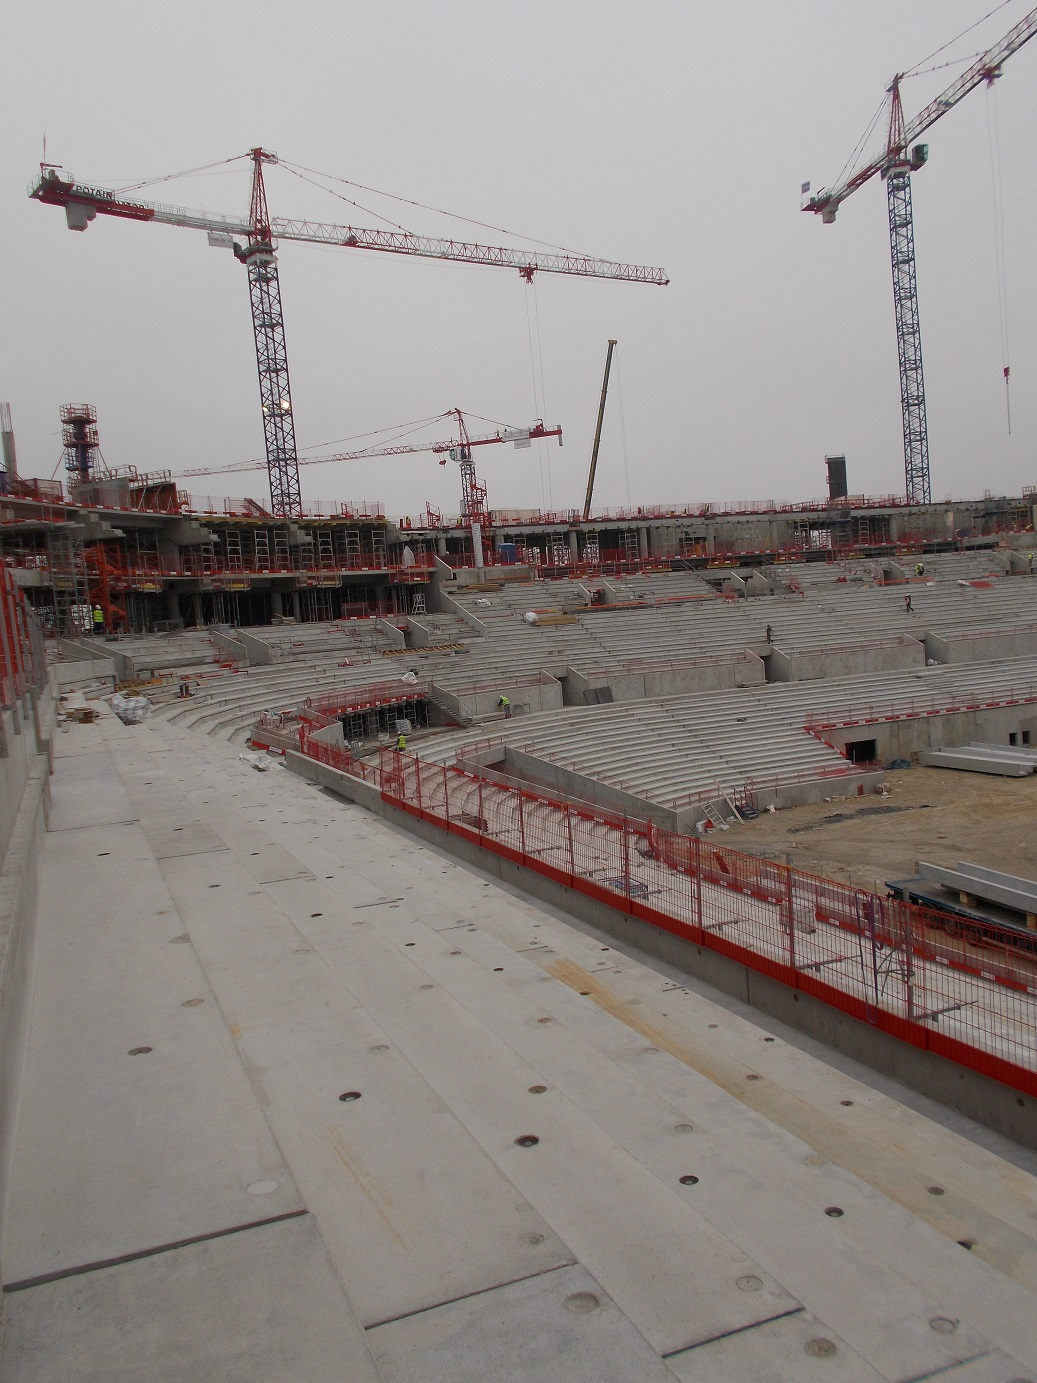 chantier-construction-virage-nord-grand-stade-lyon